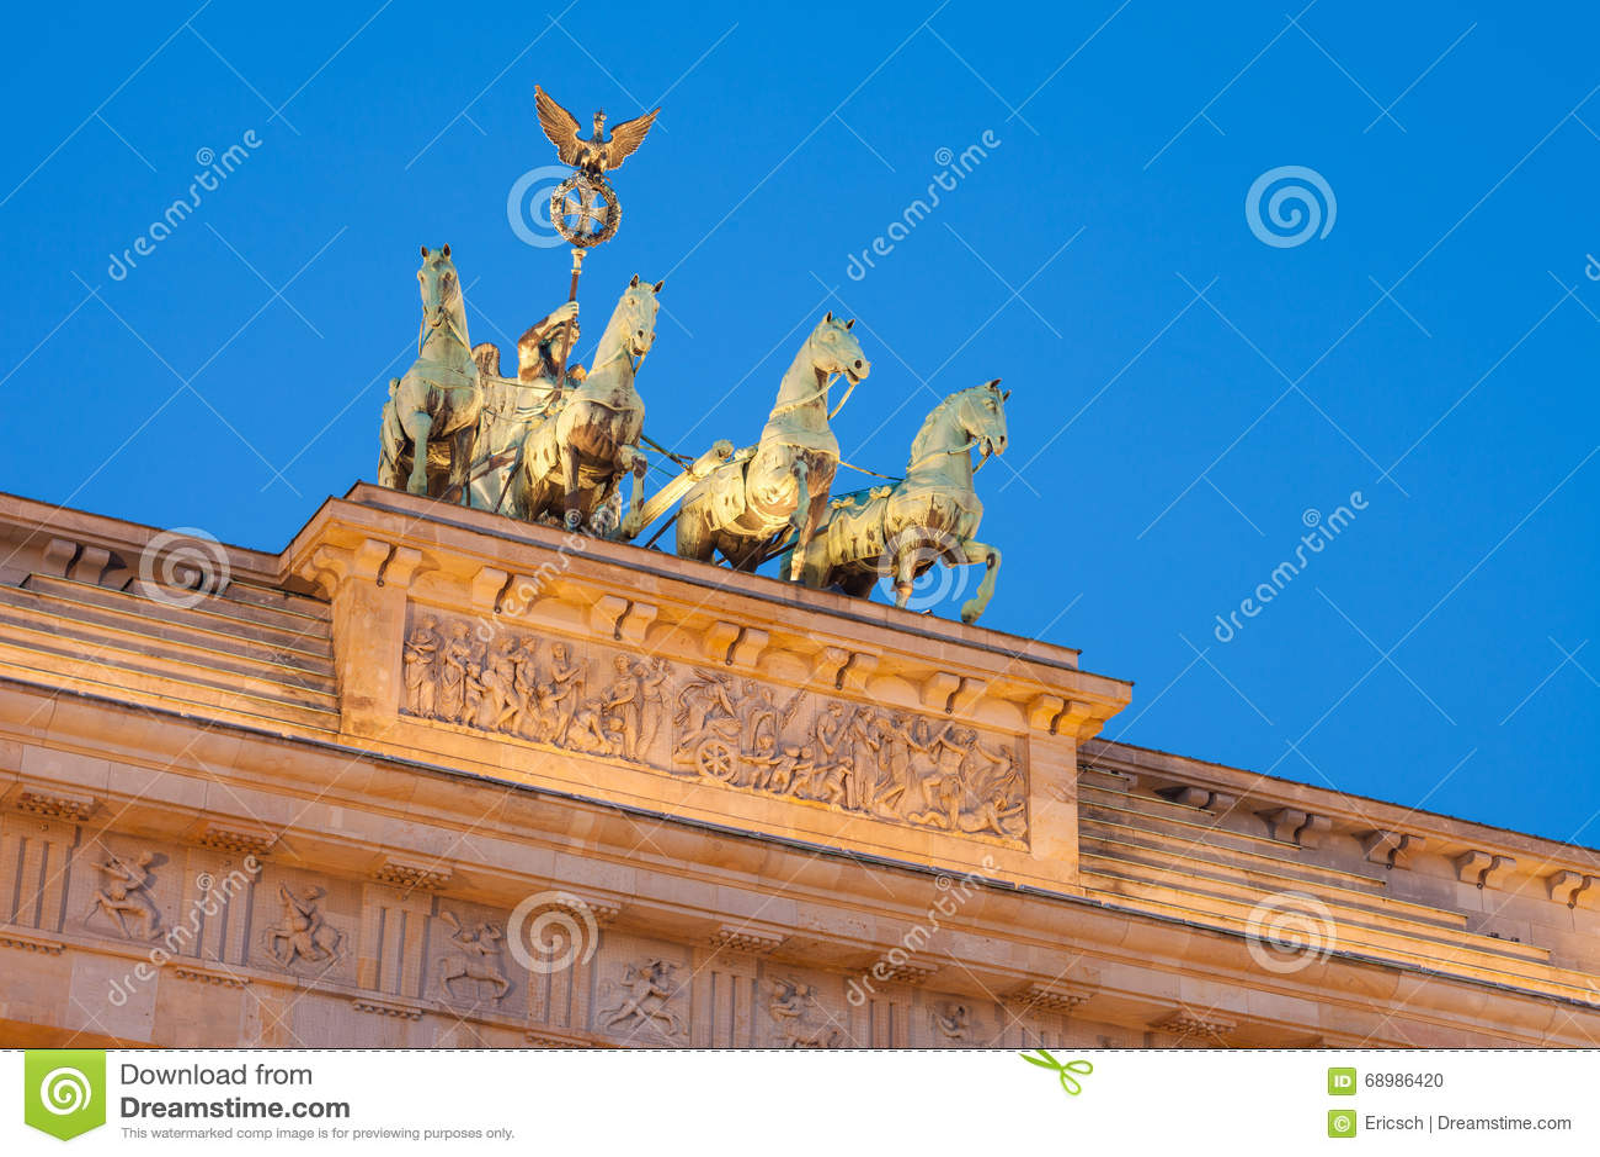 Puerta de Brandeburgo (Tor de Brandenburger)